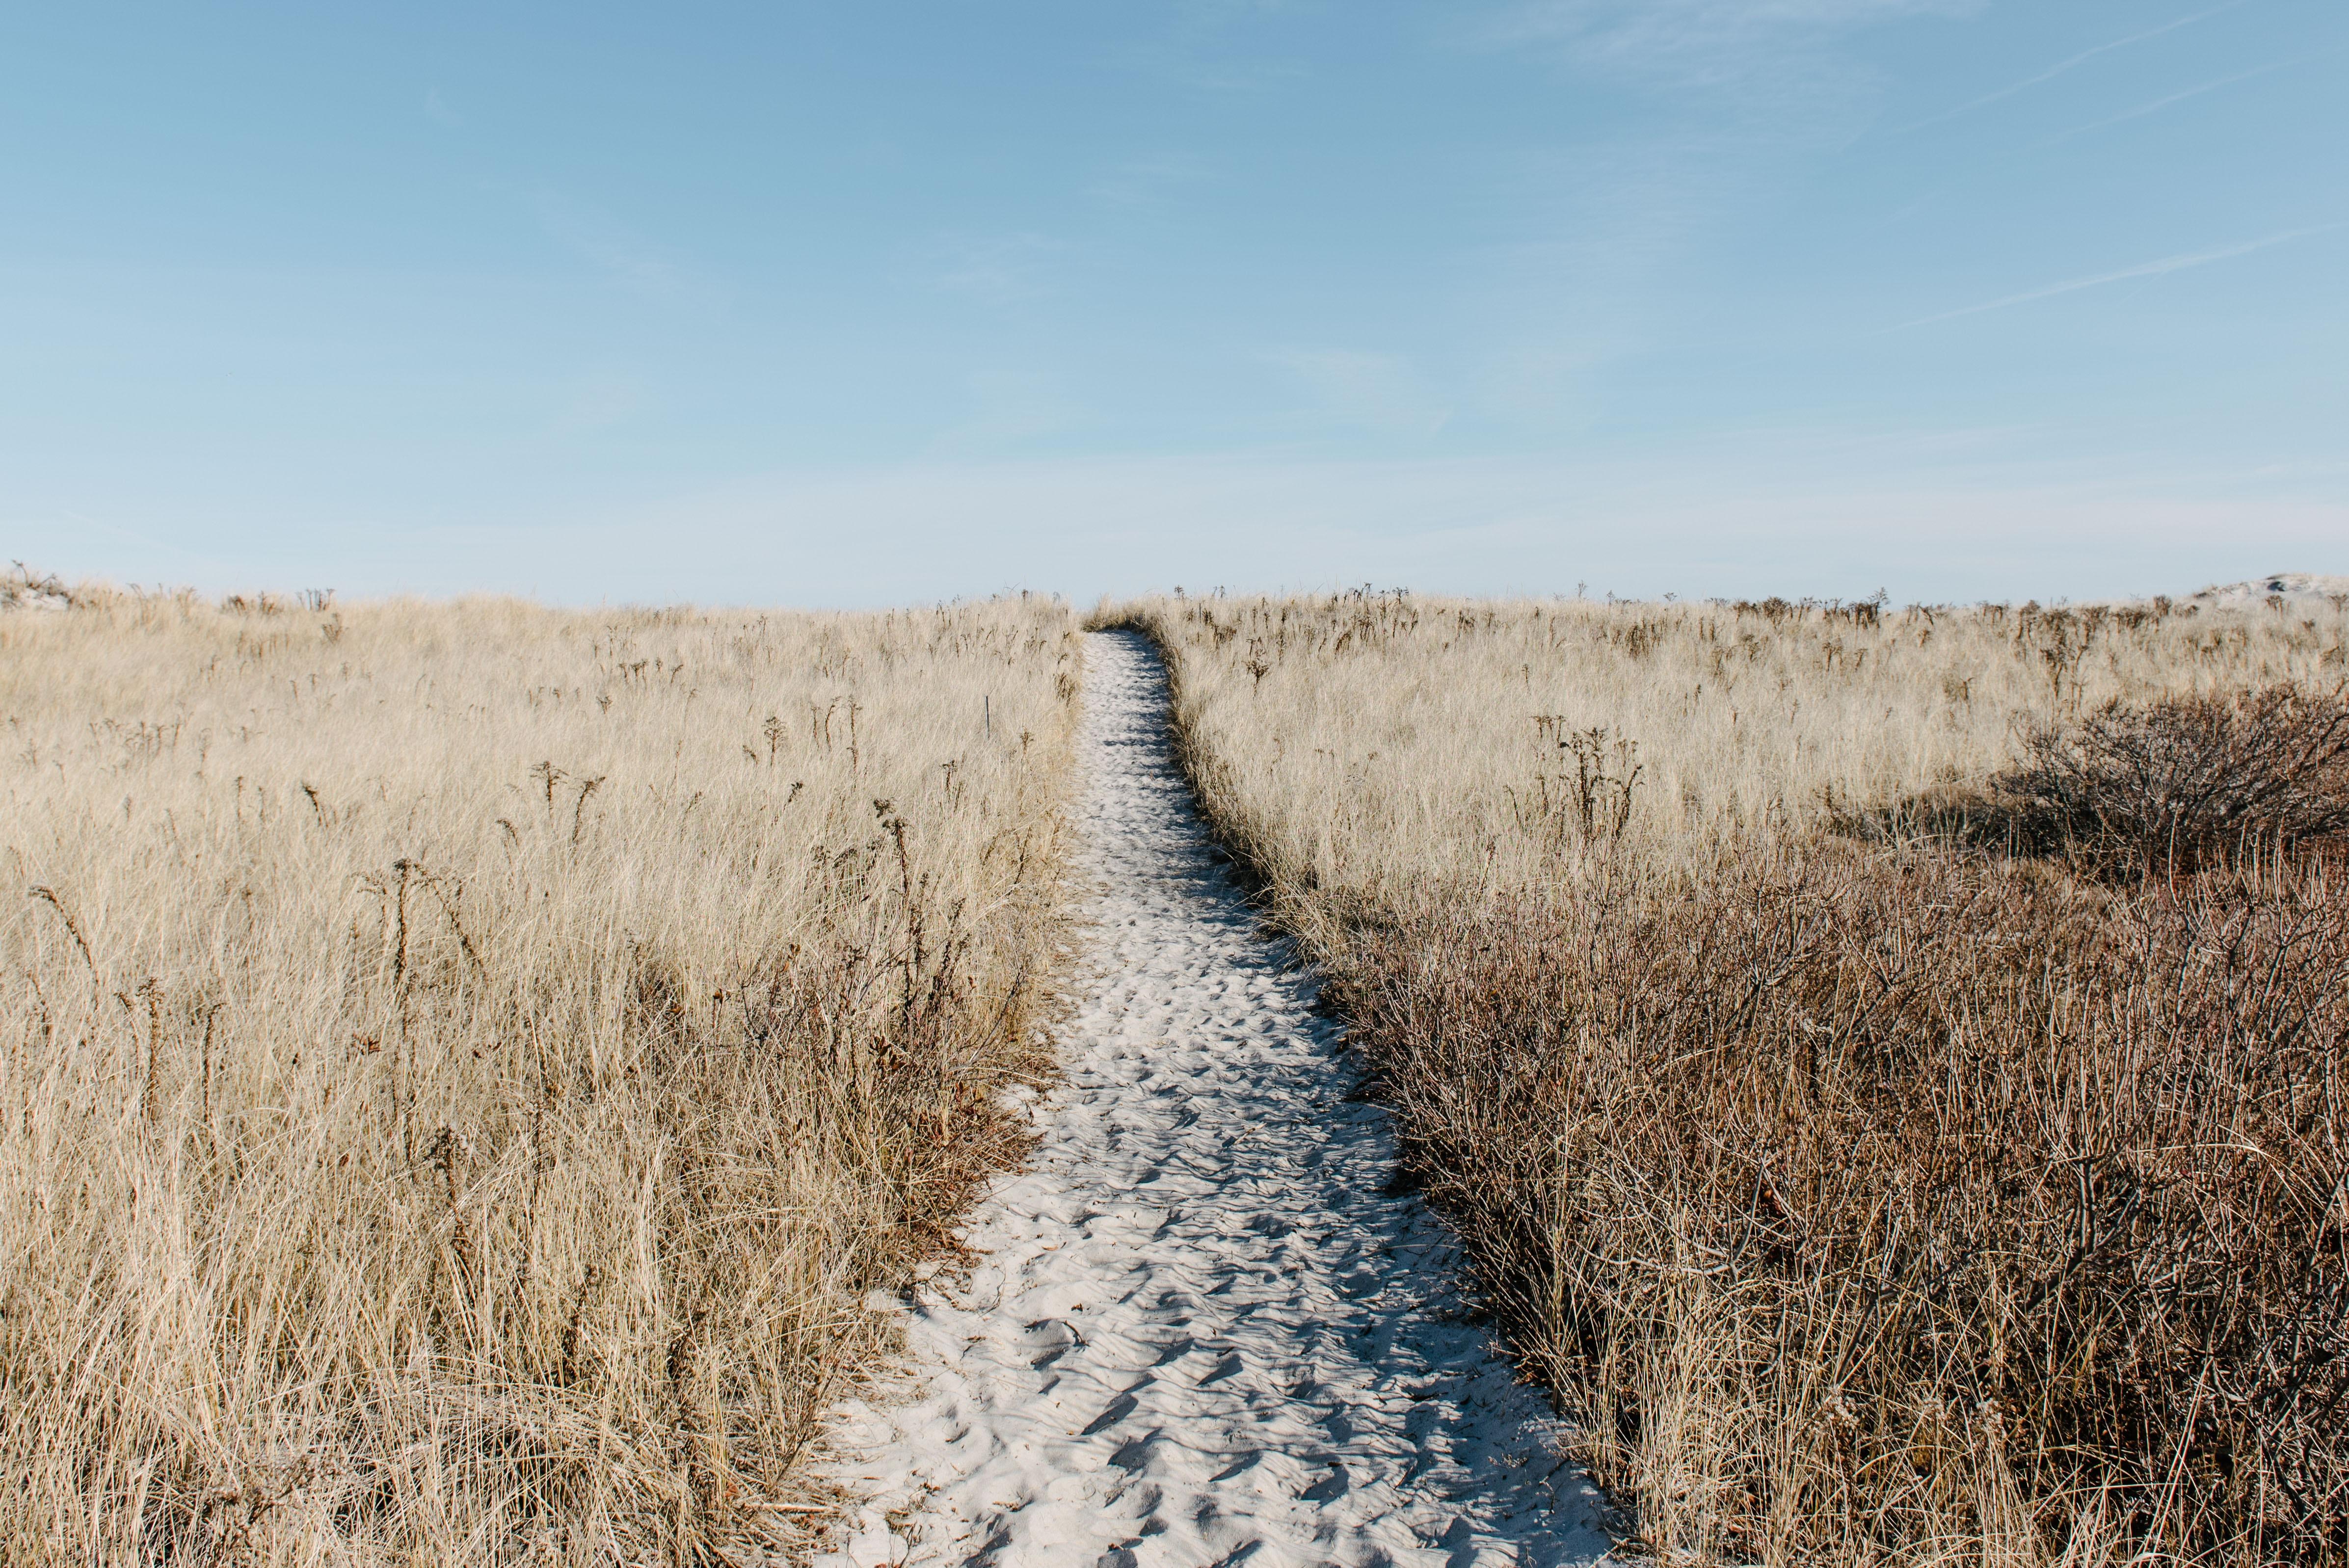 Sand path with footprints through the grass field at Crane Beach